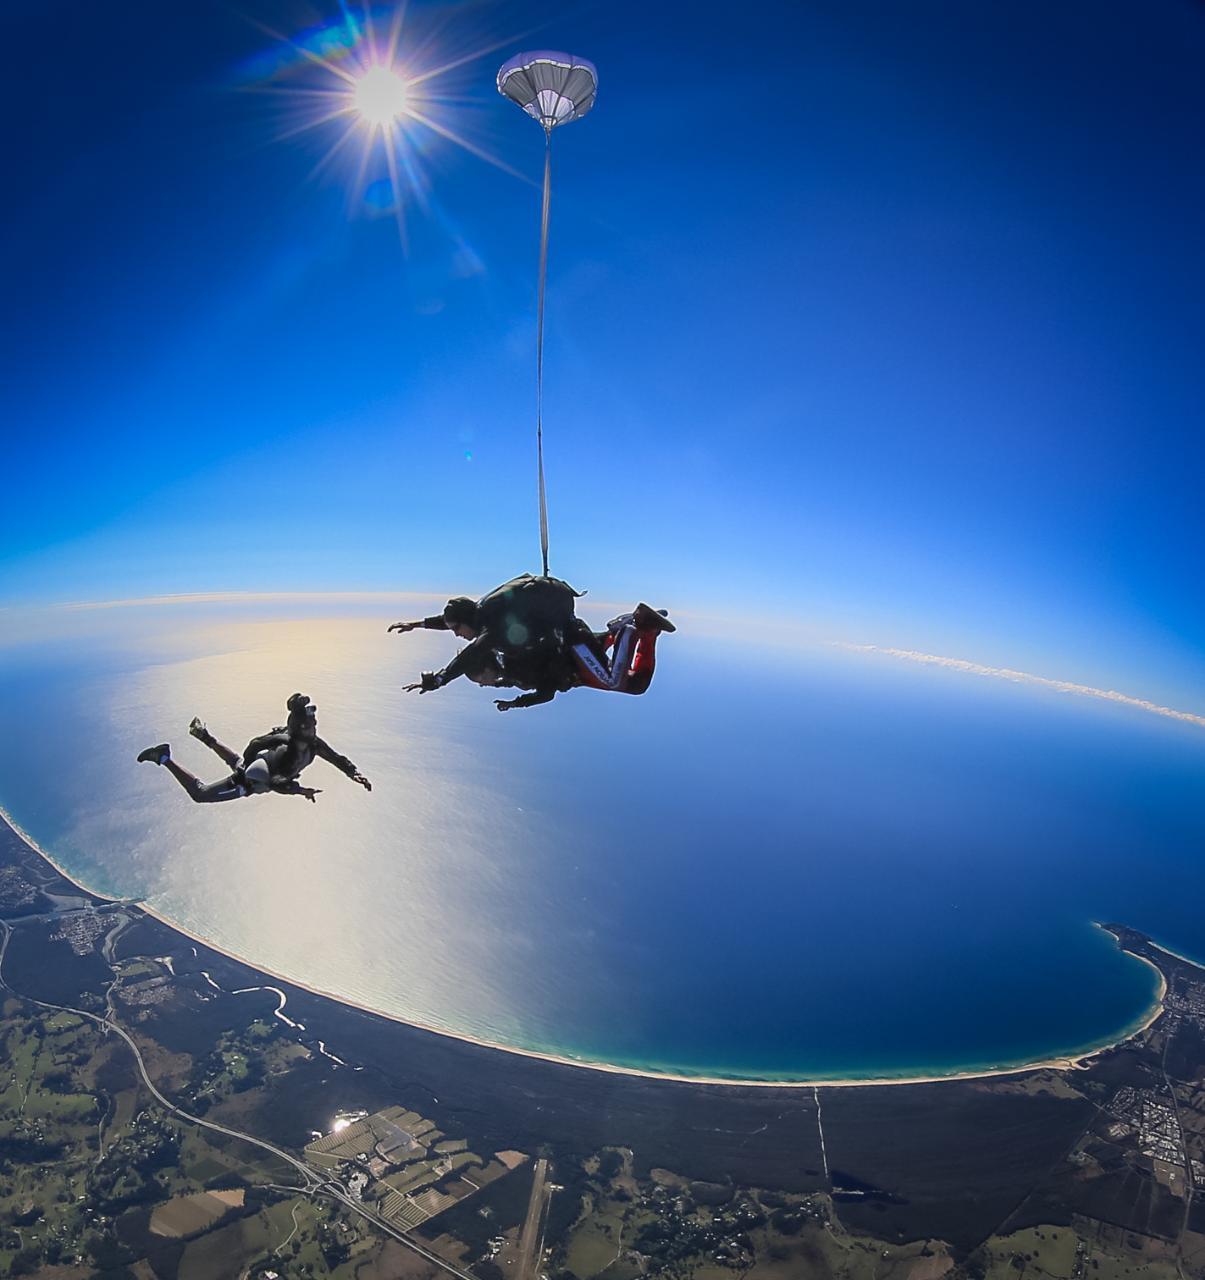 Bond University SPECIAL! Australia's highest skydive